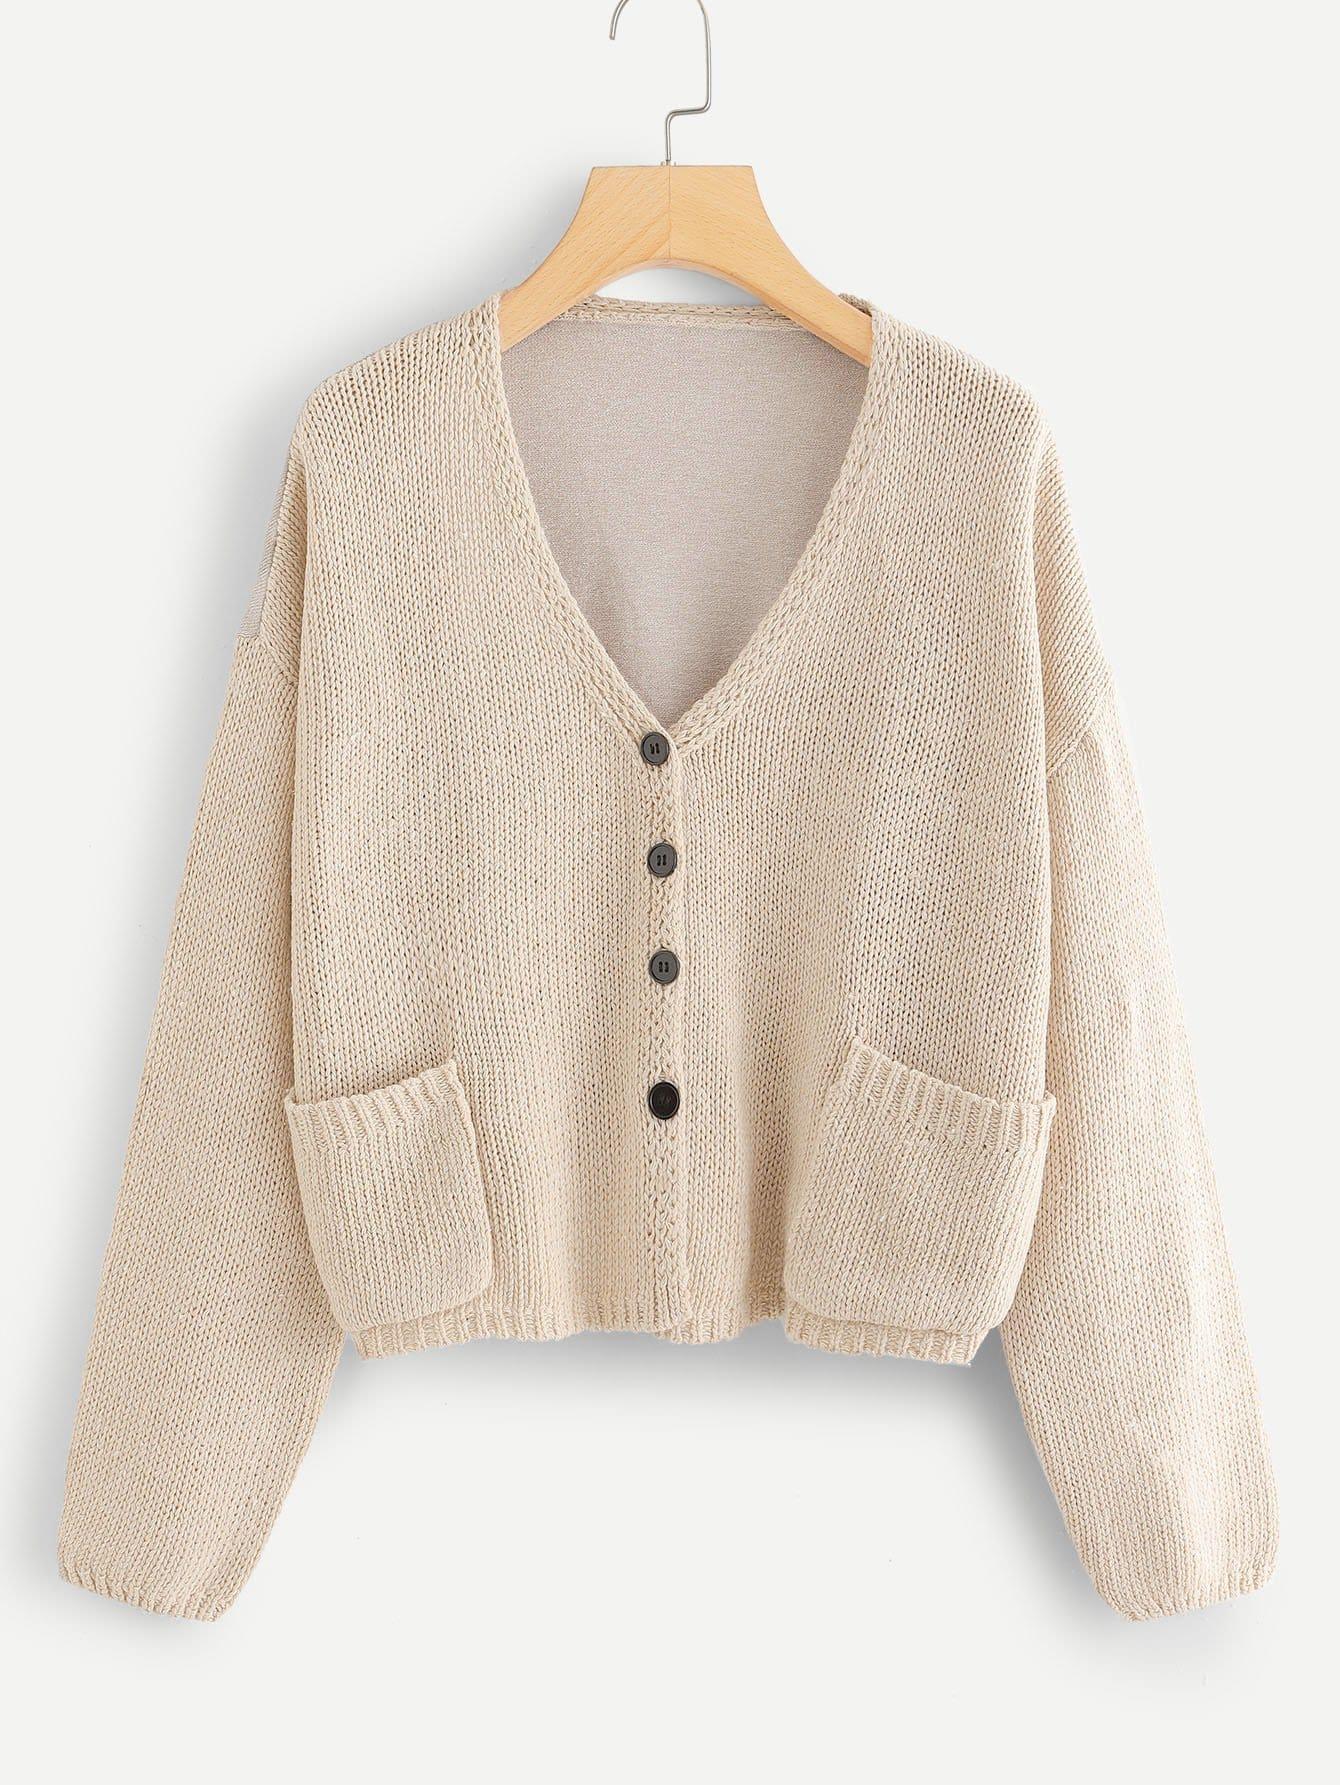 Купить Карманный патч Cut And Sew Sweater Coat, null, SheIn